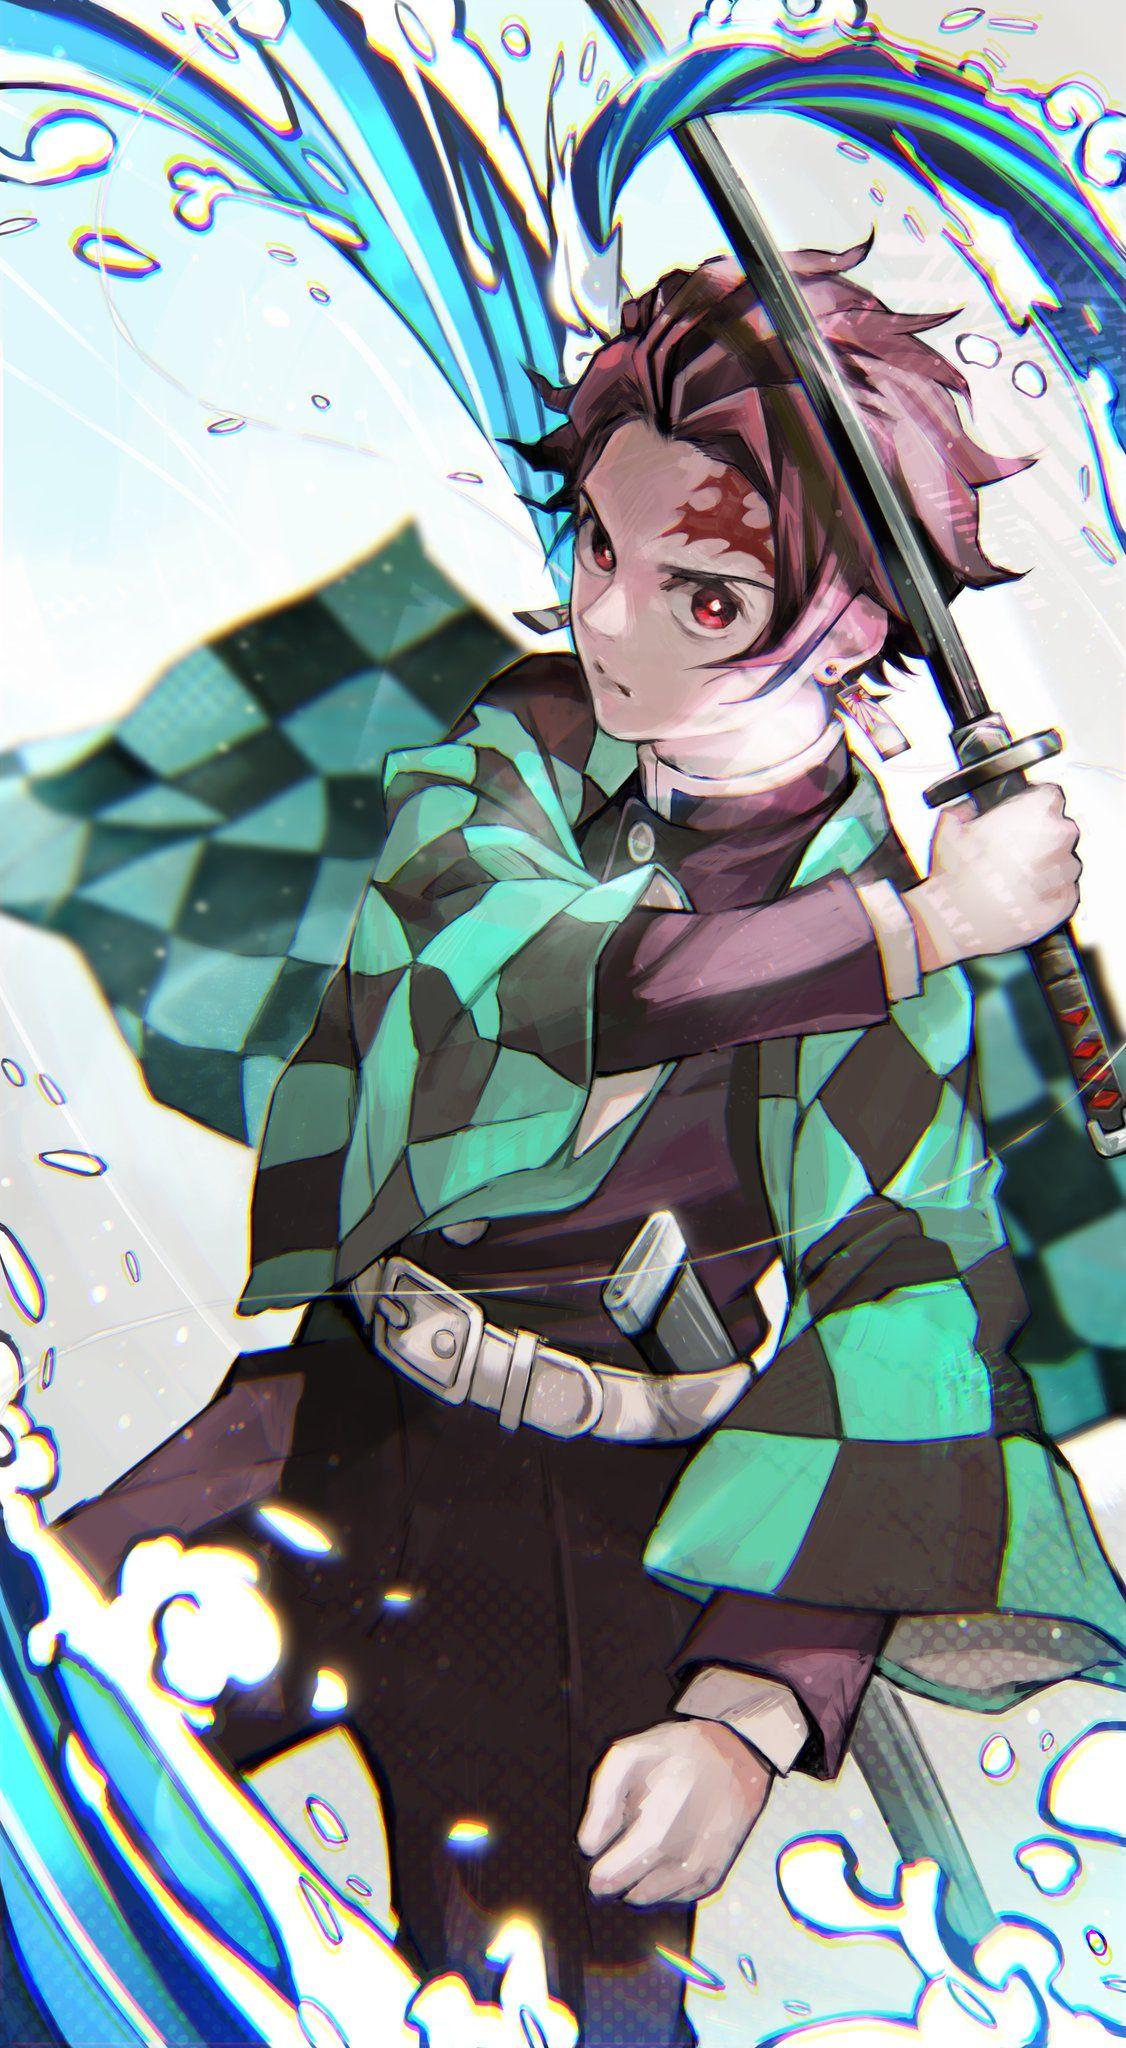 anime art on manga anime anime anime shows pinterest